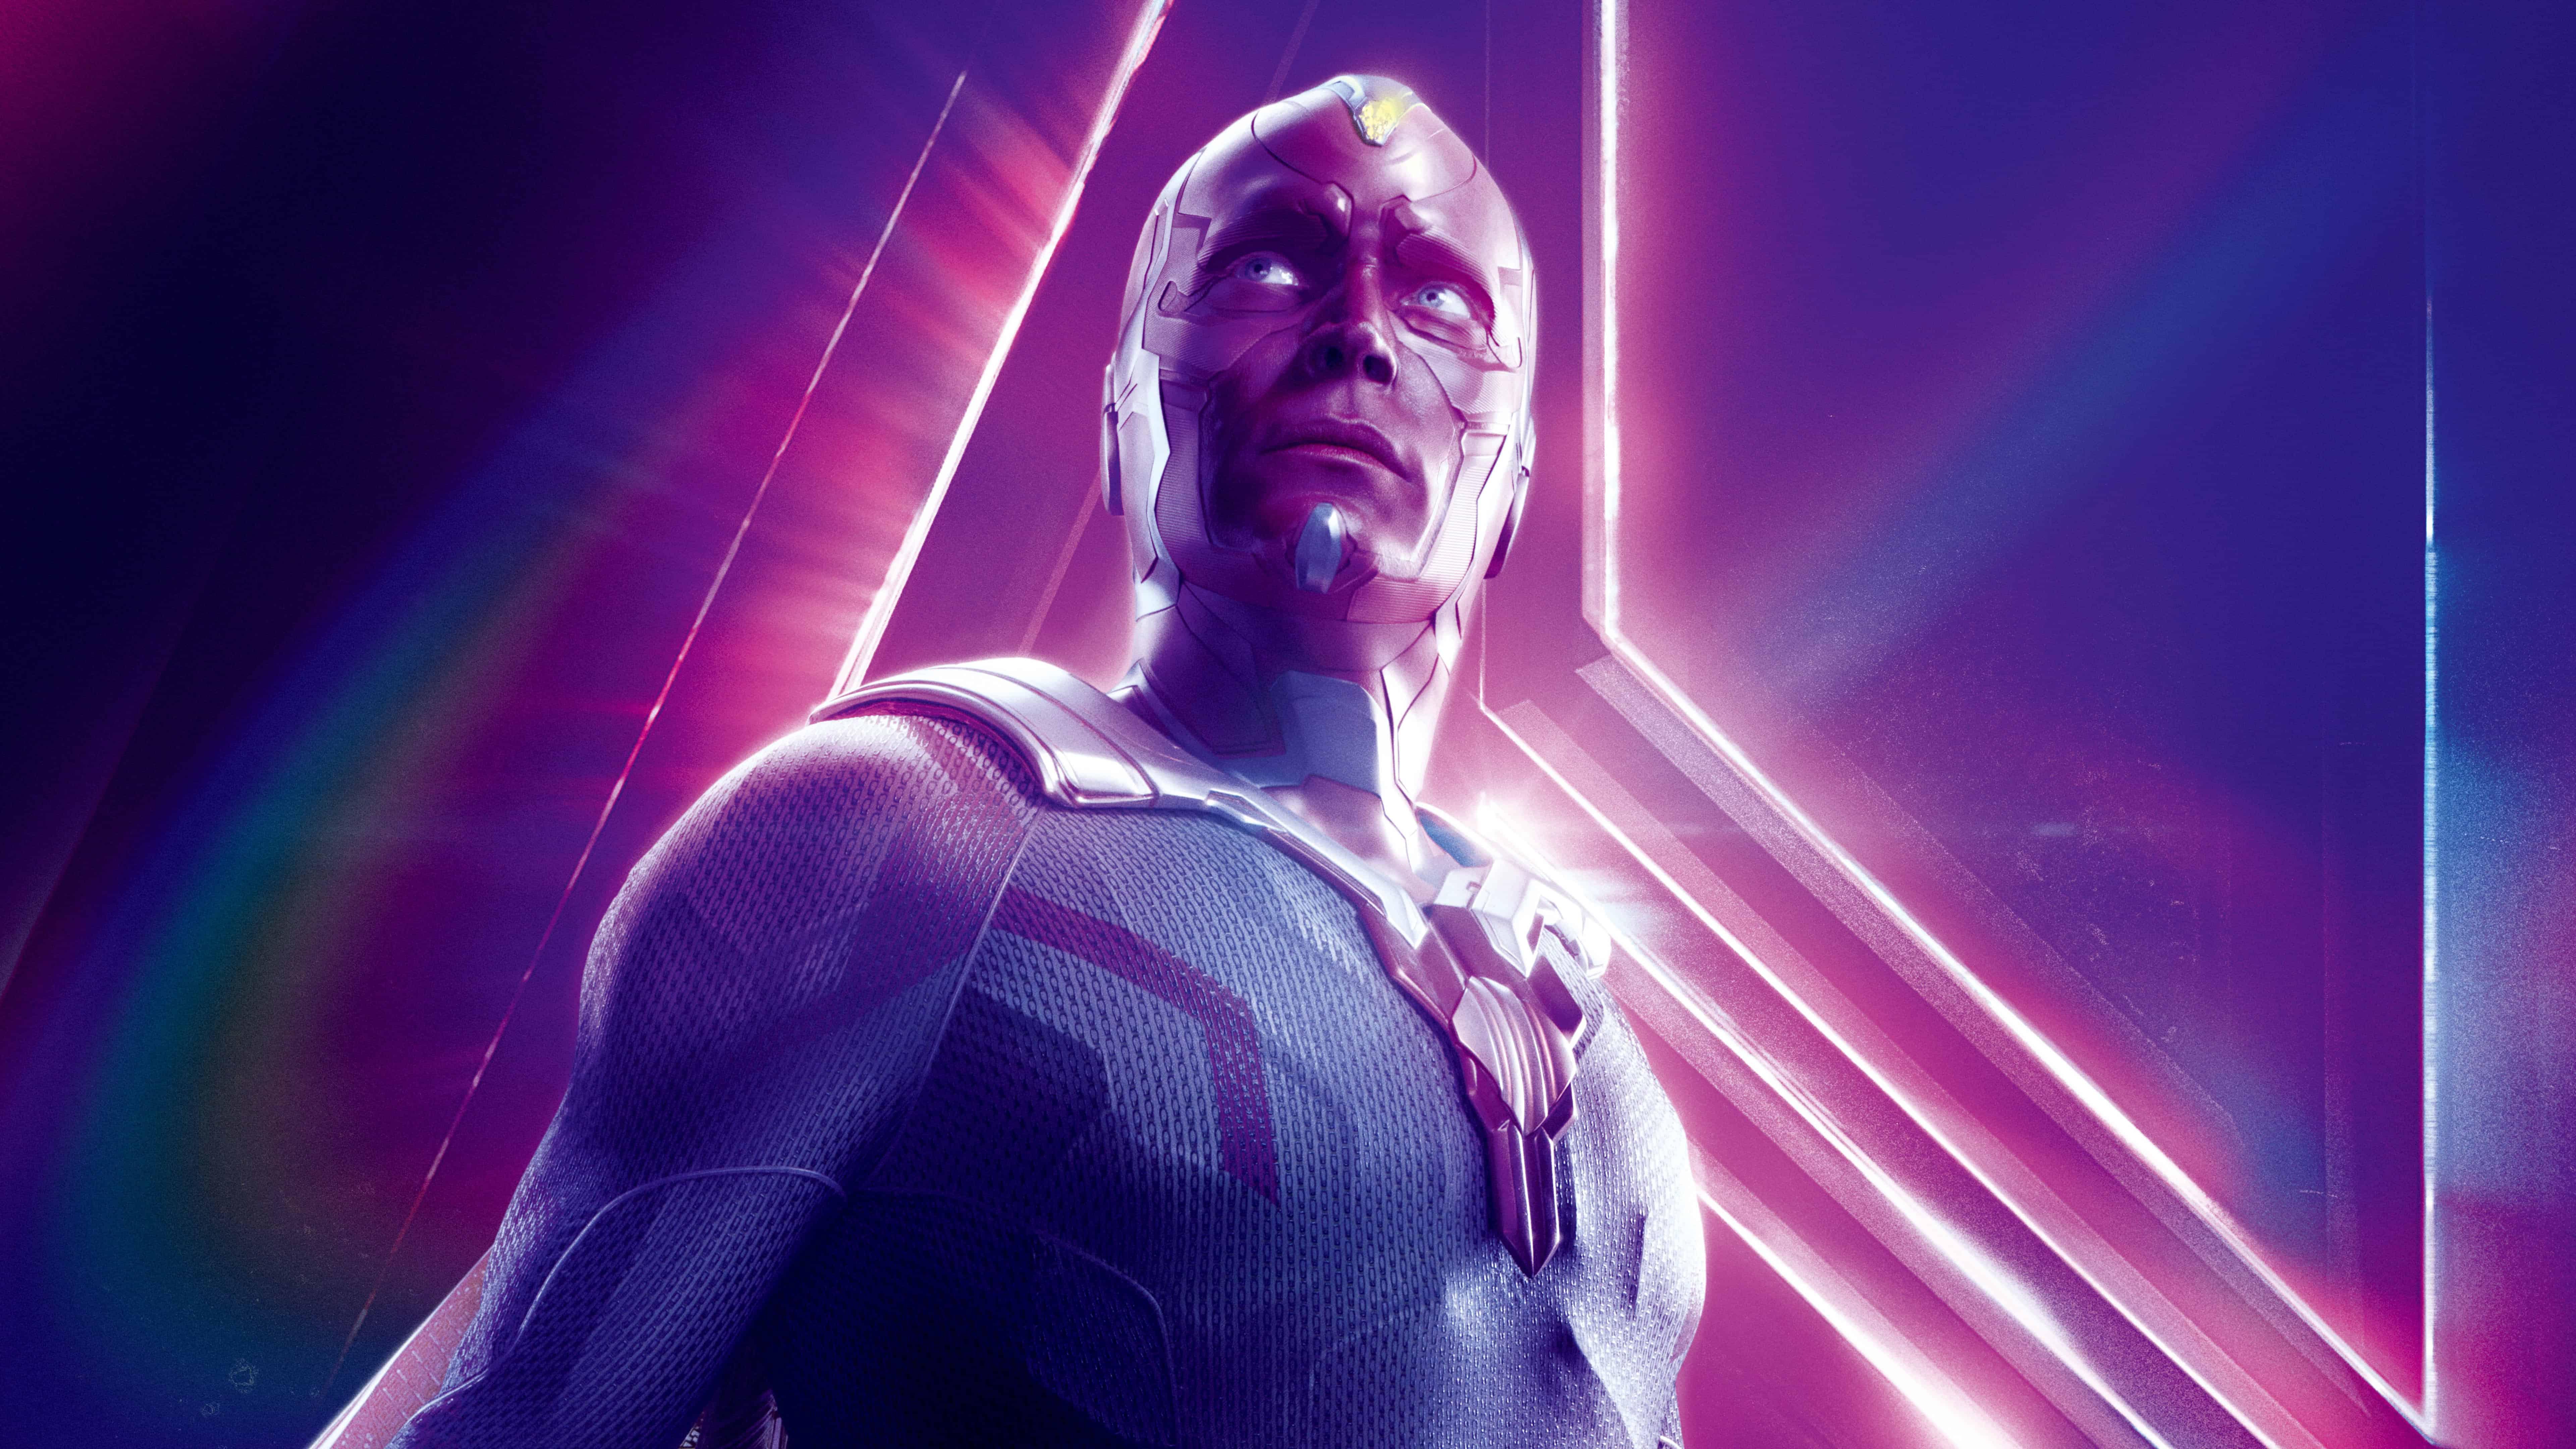 avengers infinity war vision uhd 8k wallpaper